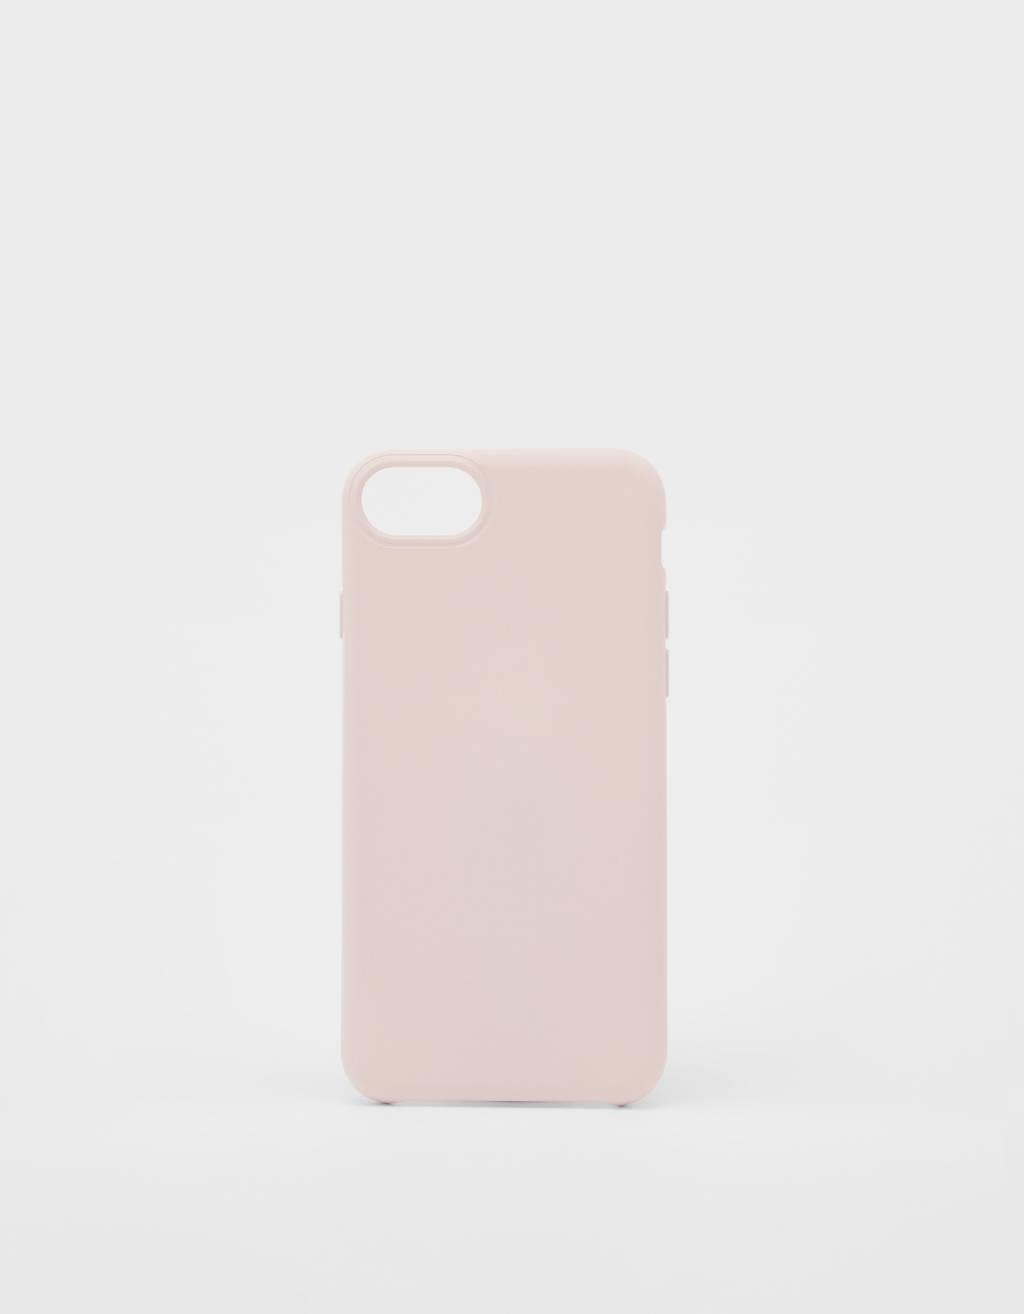 Carcasa monocolor iPhone 6 / 6S / 7 / 8